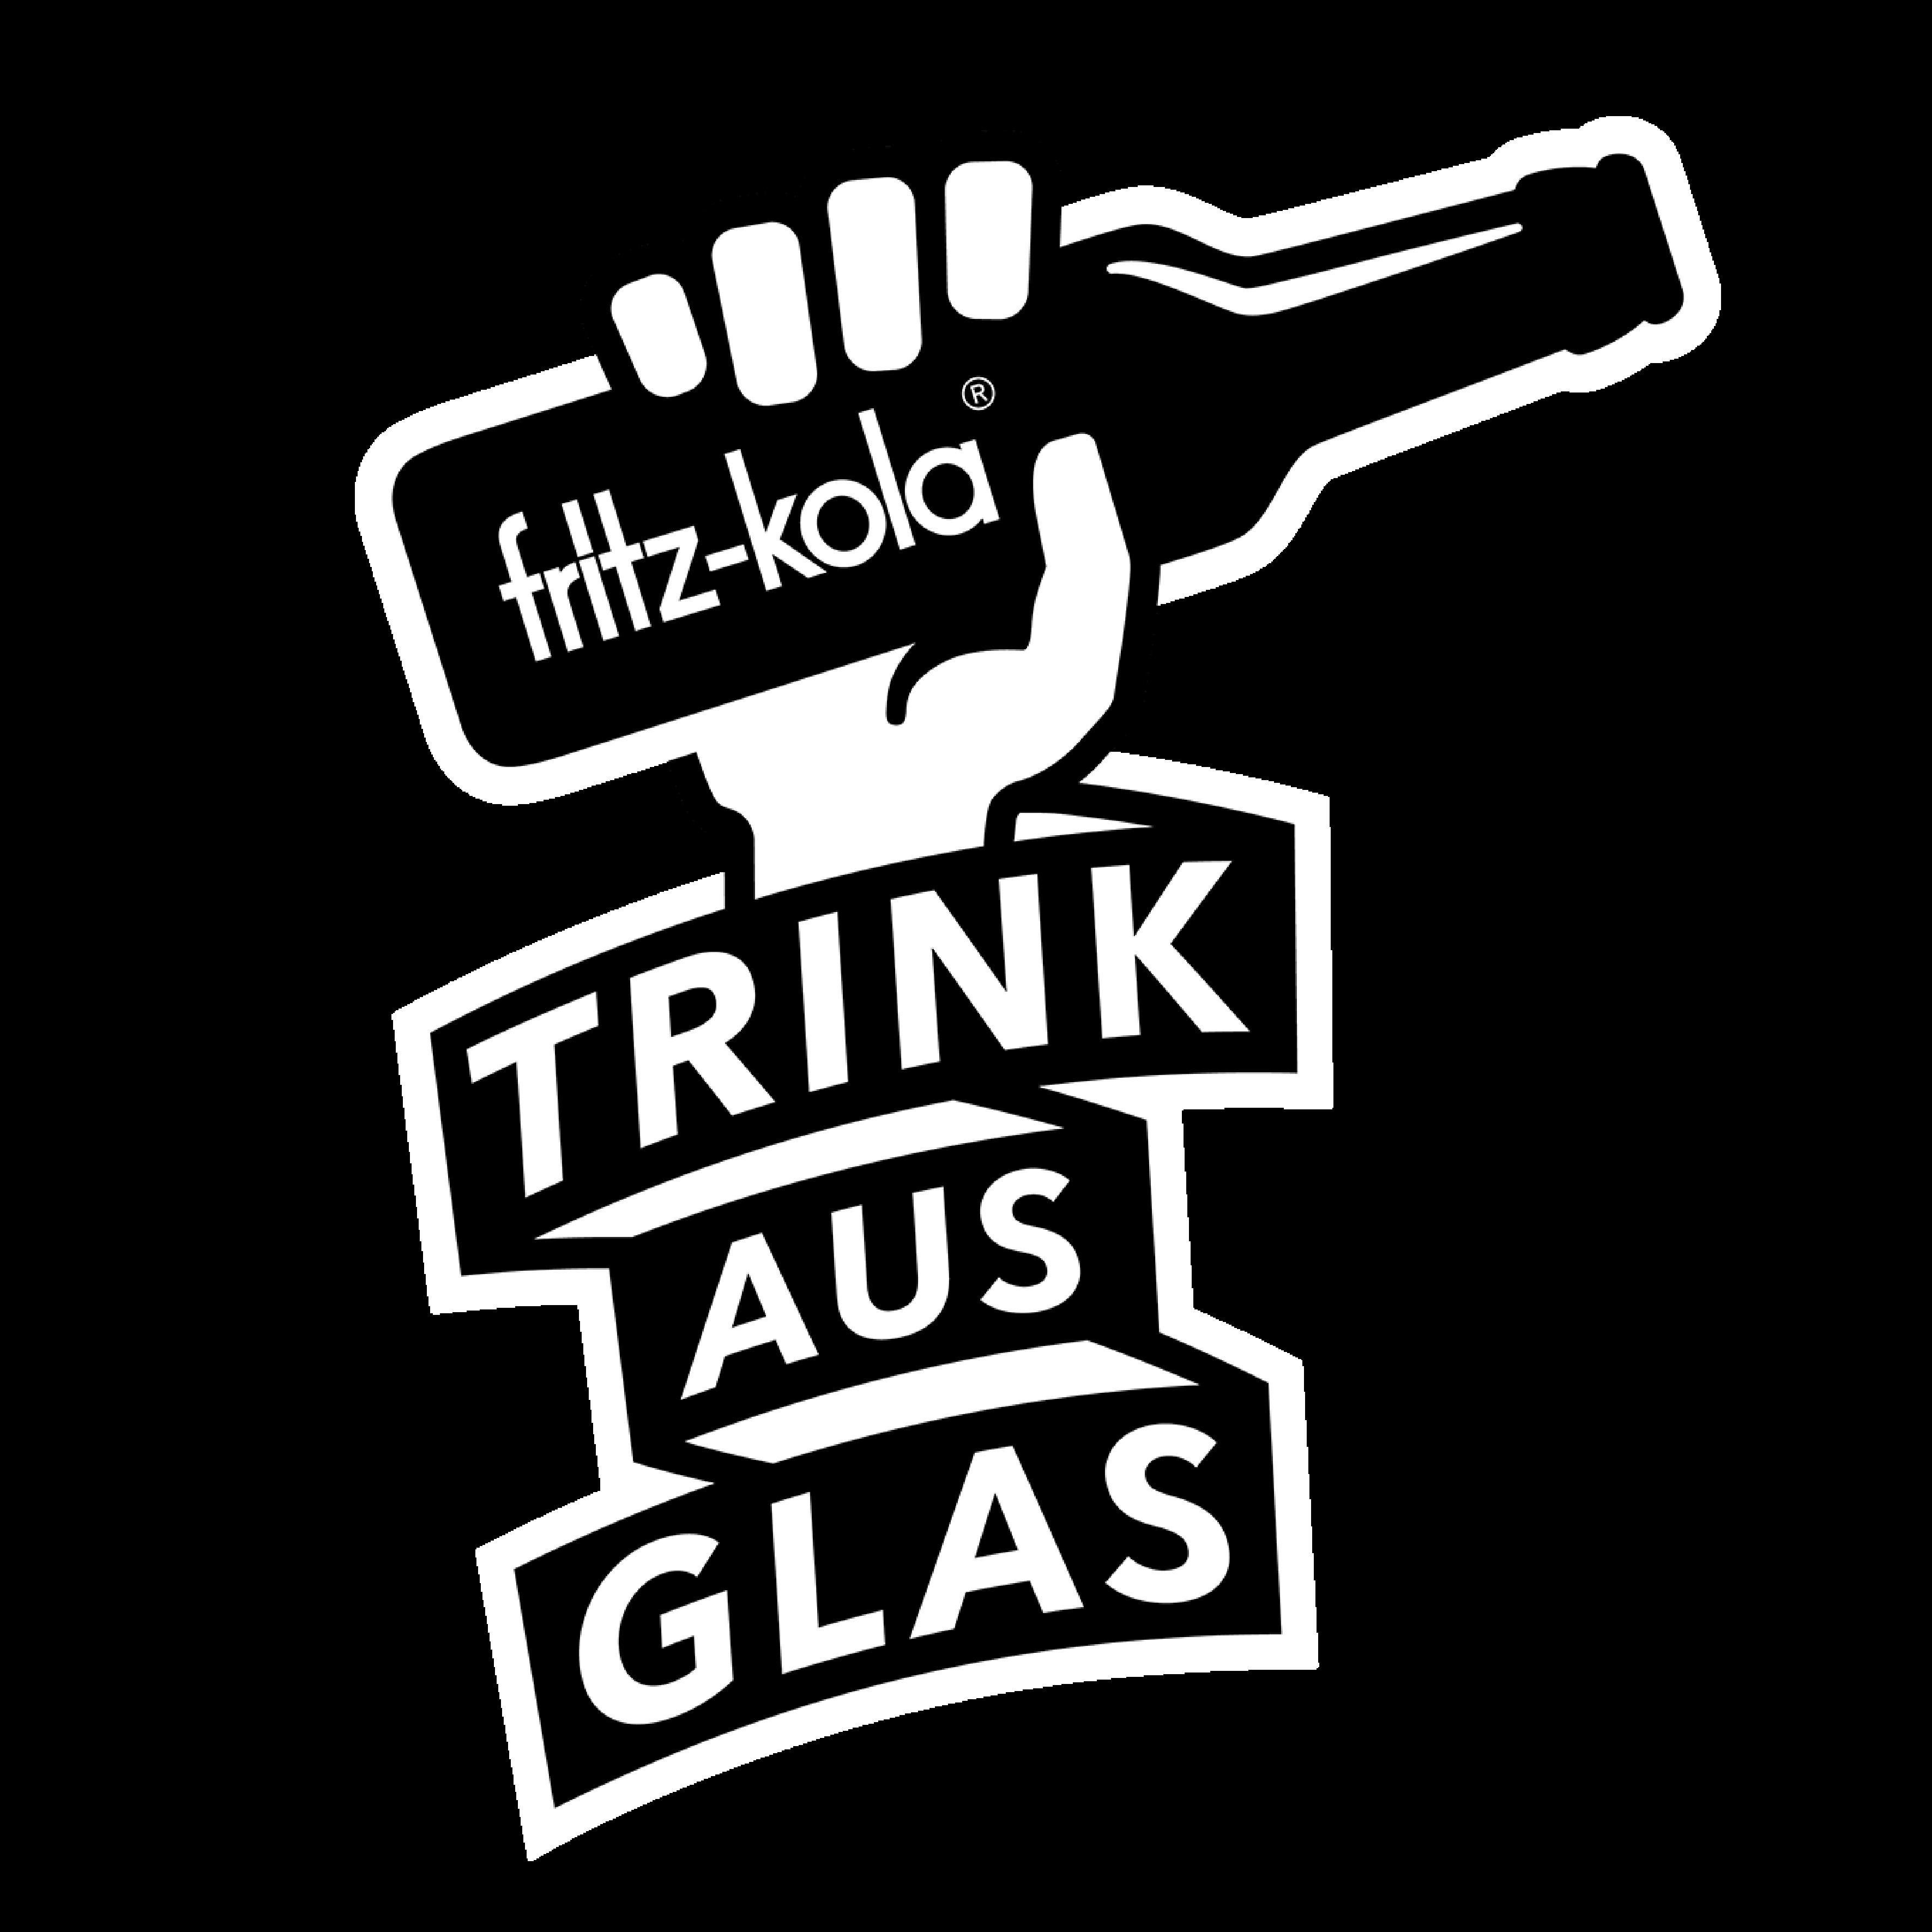 Fritz-Cola